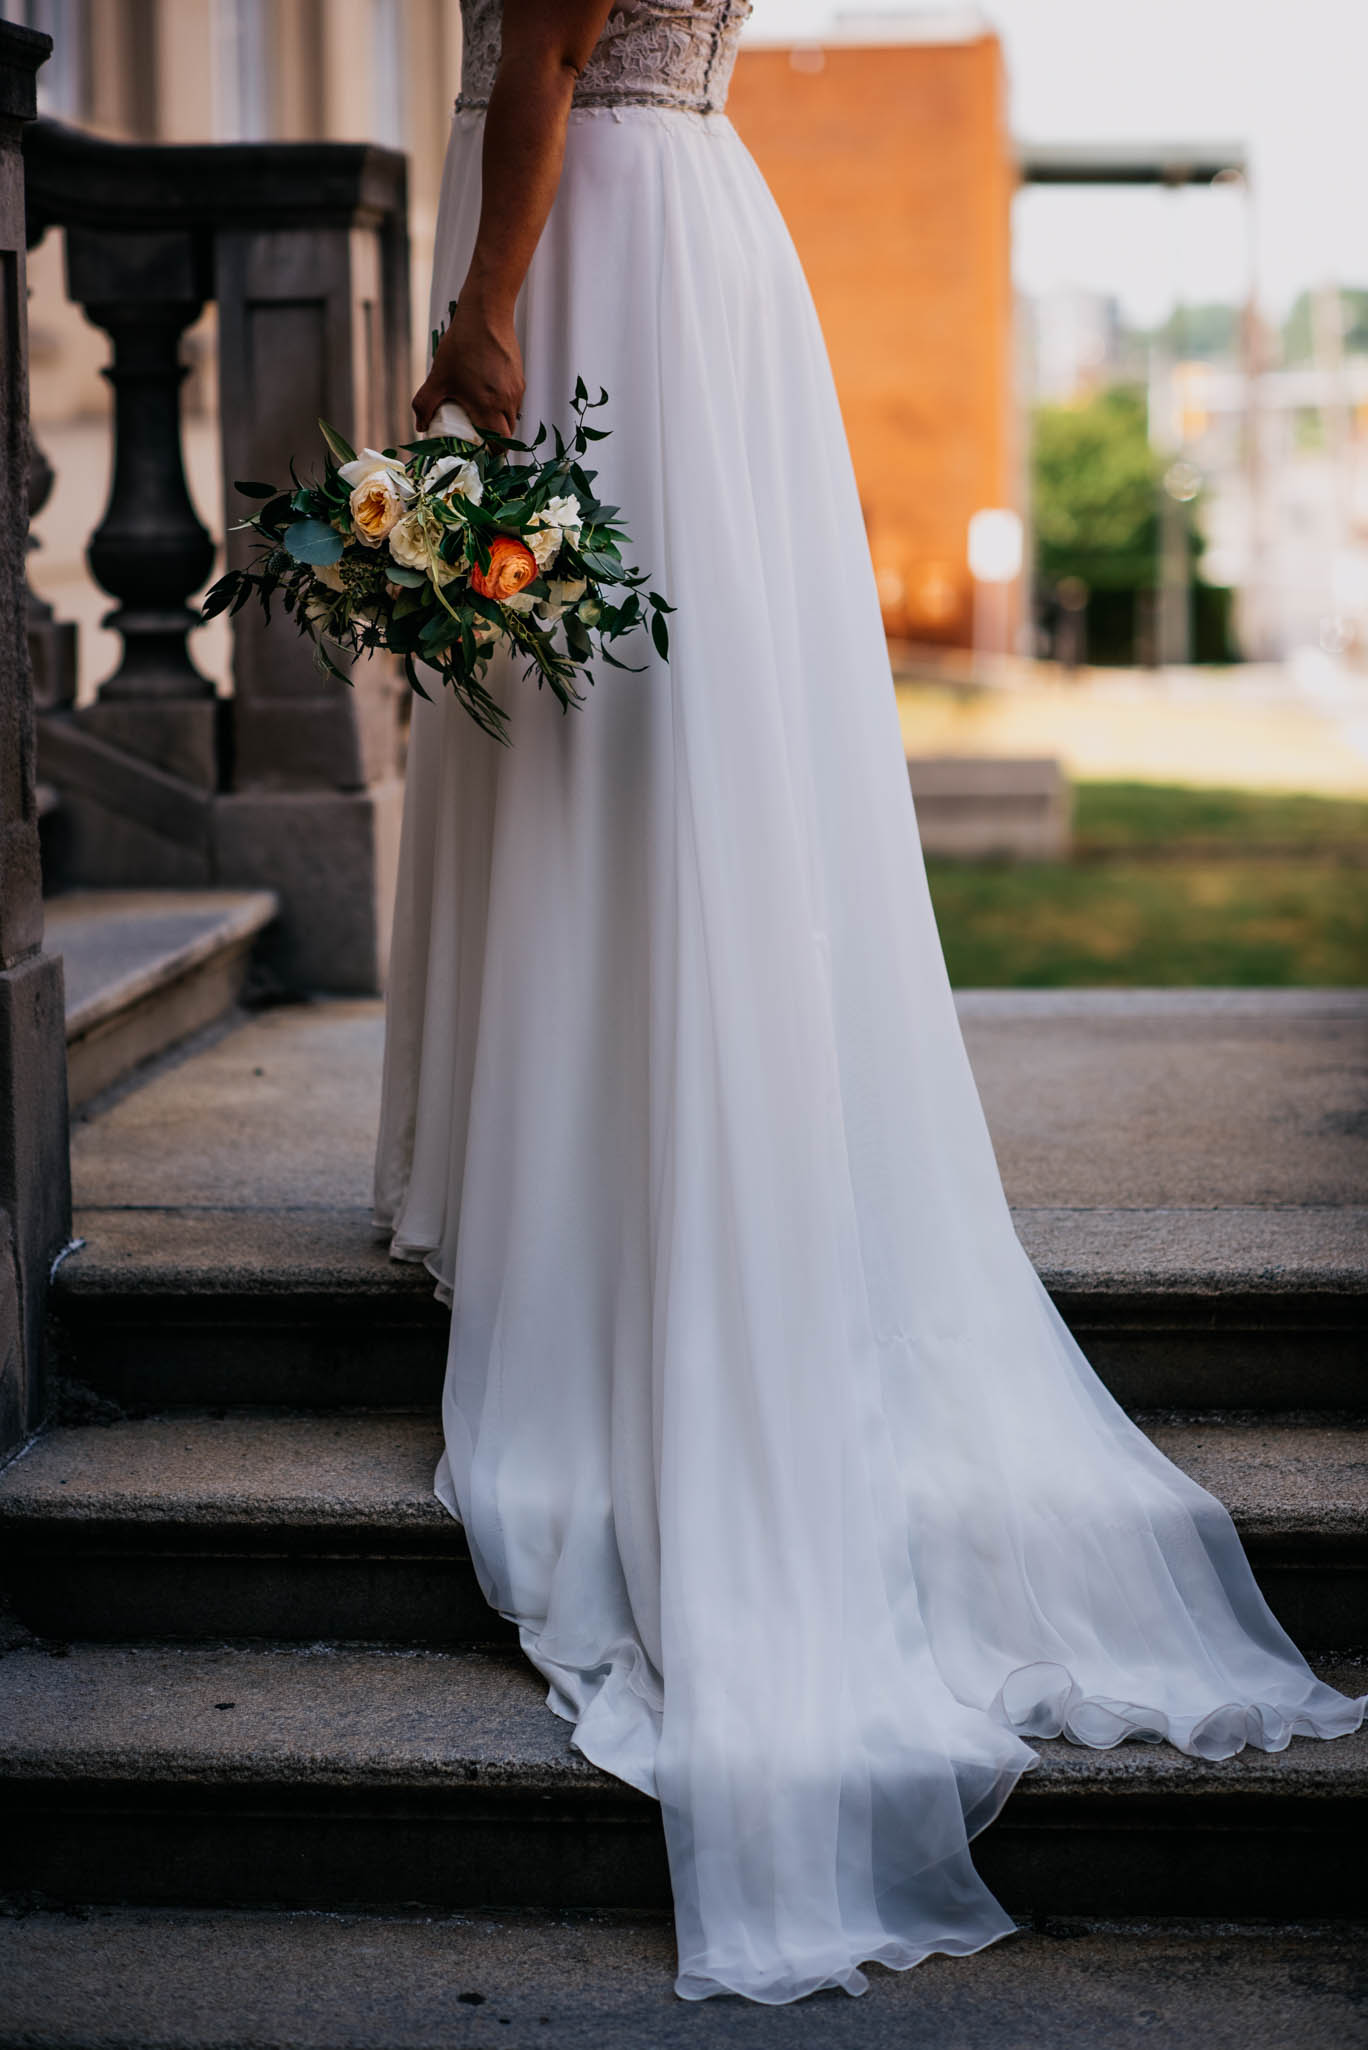 rickhouse-weddings-durham-adam-chapin-photography-1-2.jpg